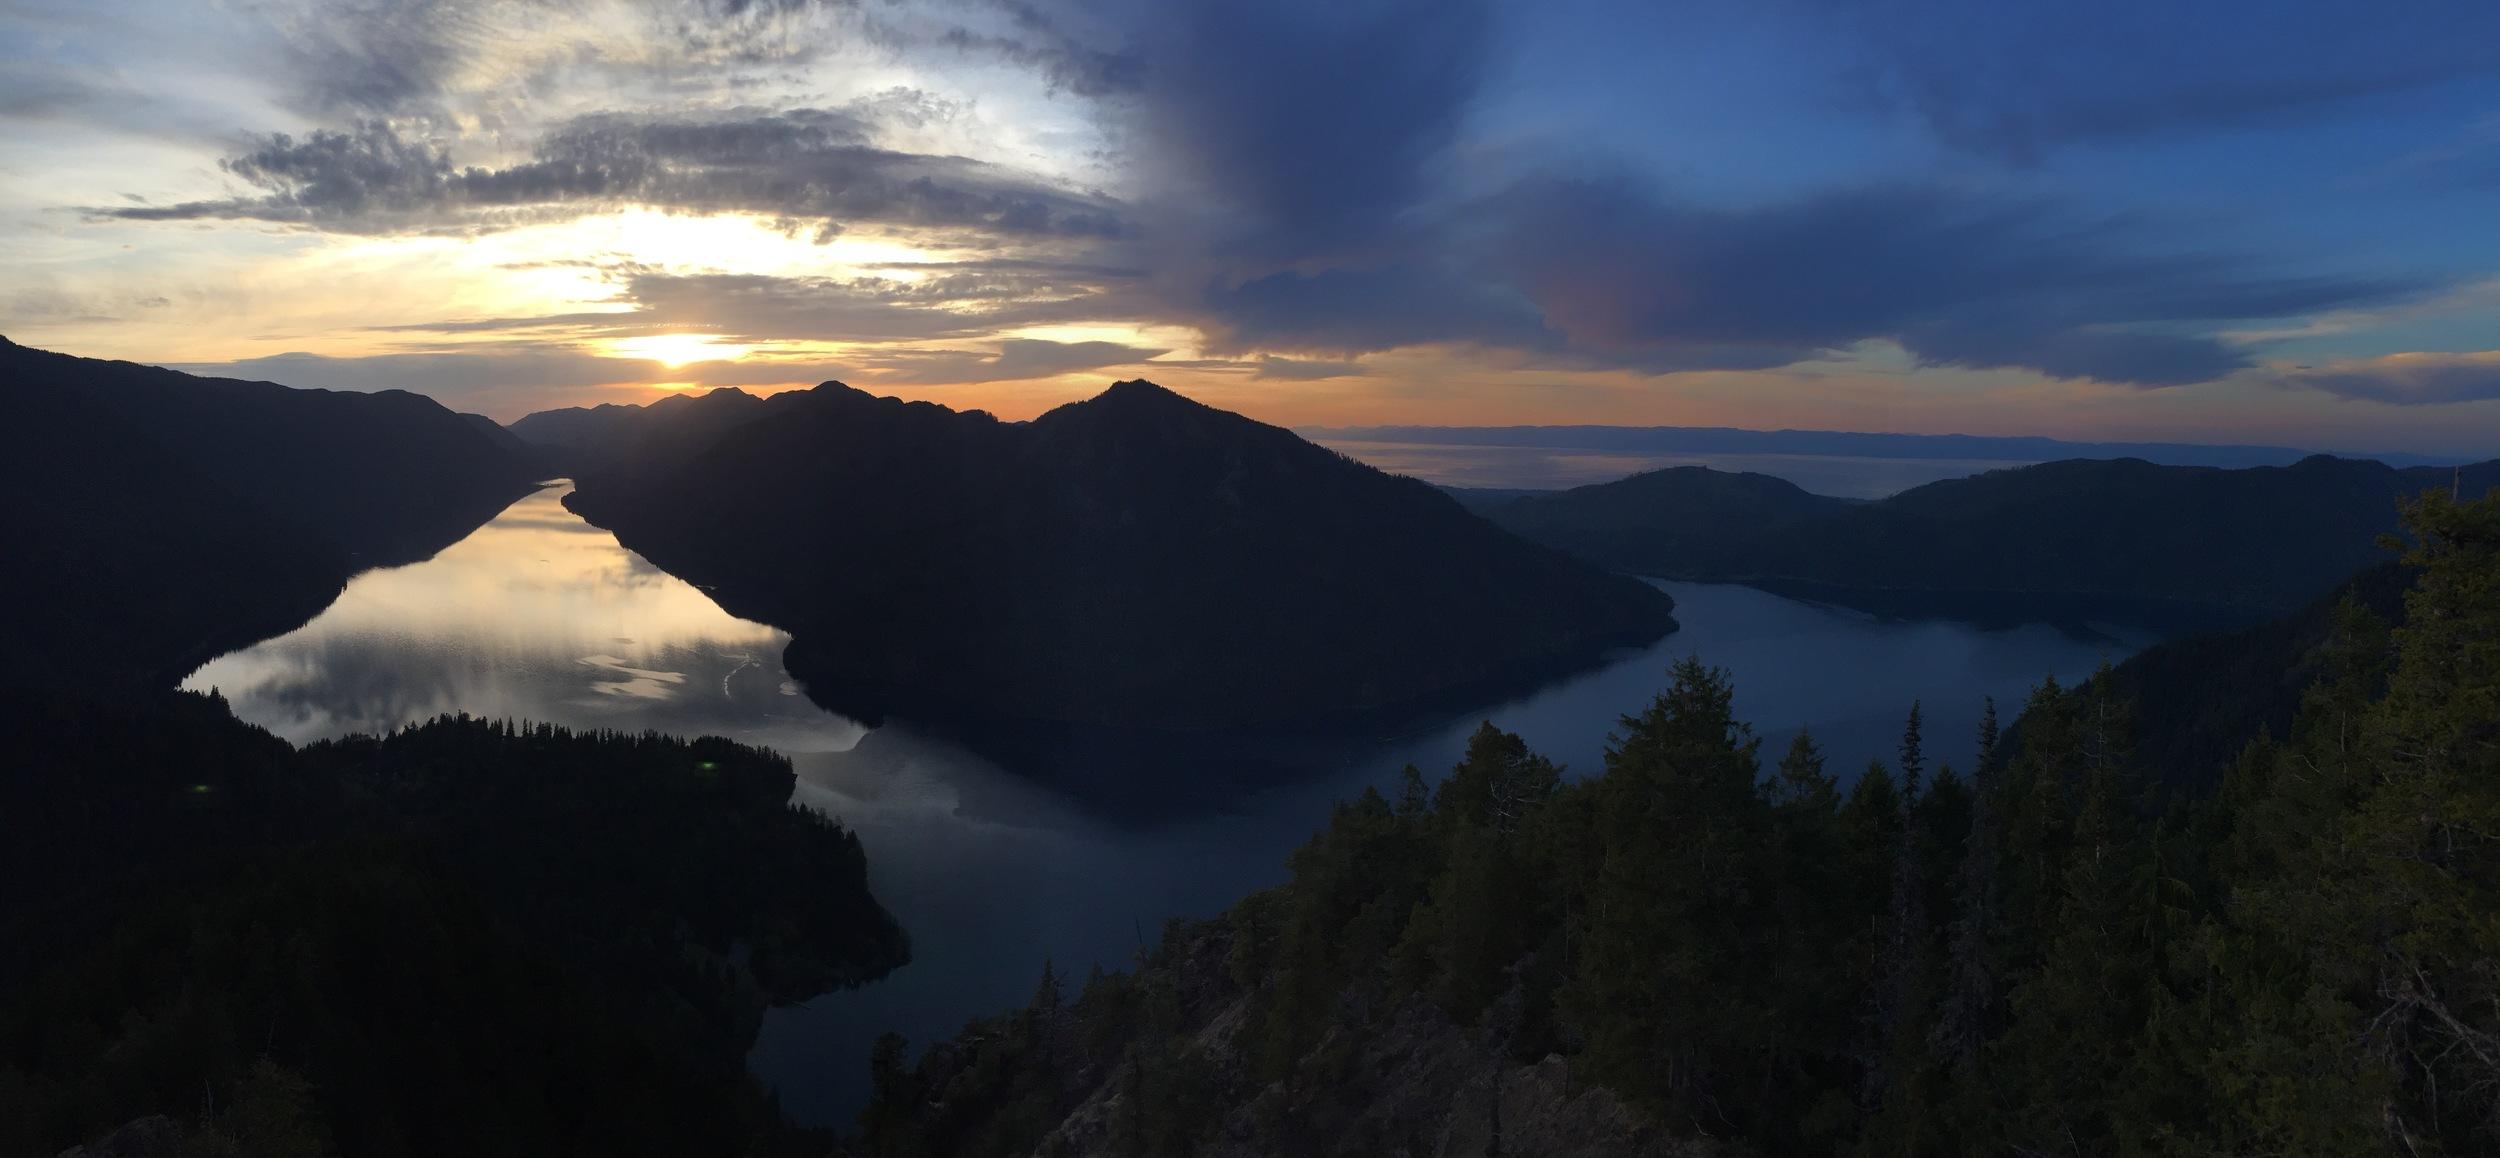 7 - pano sun setting.jpg